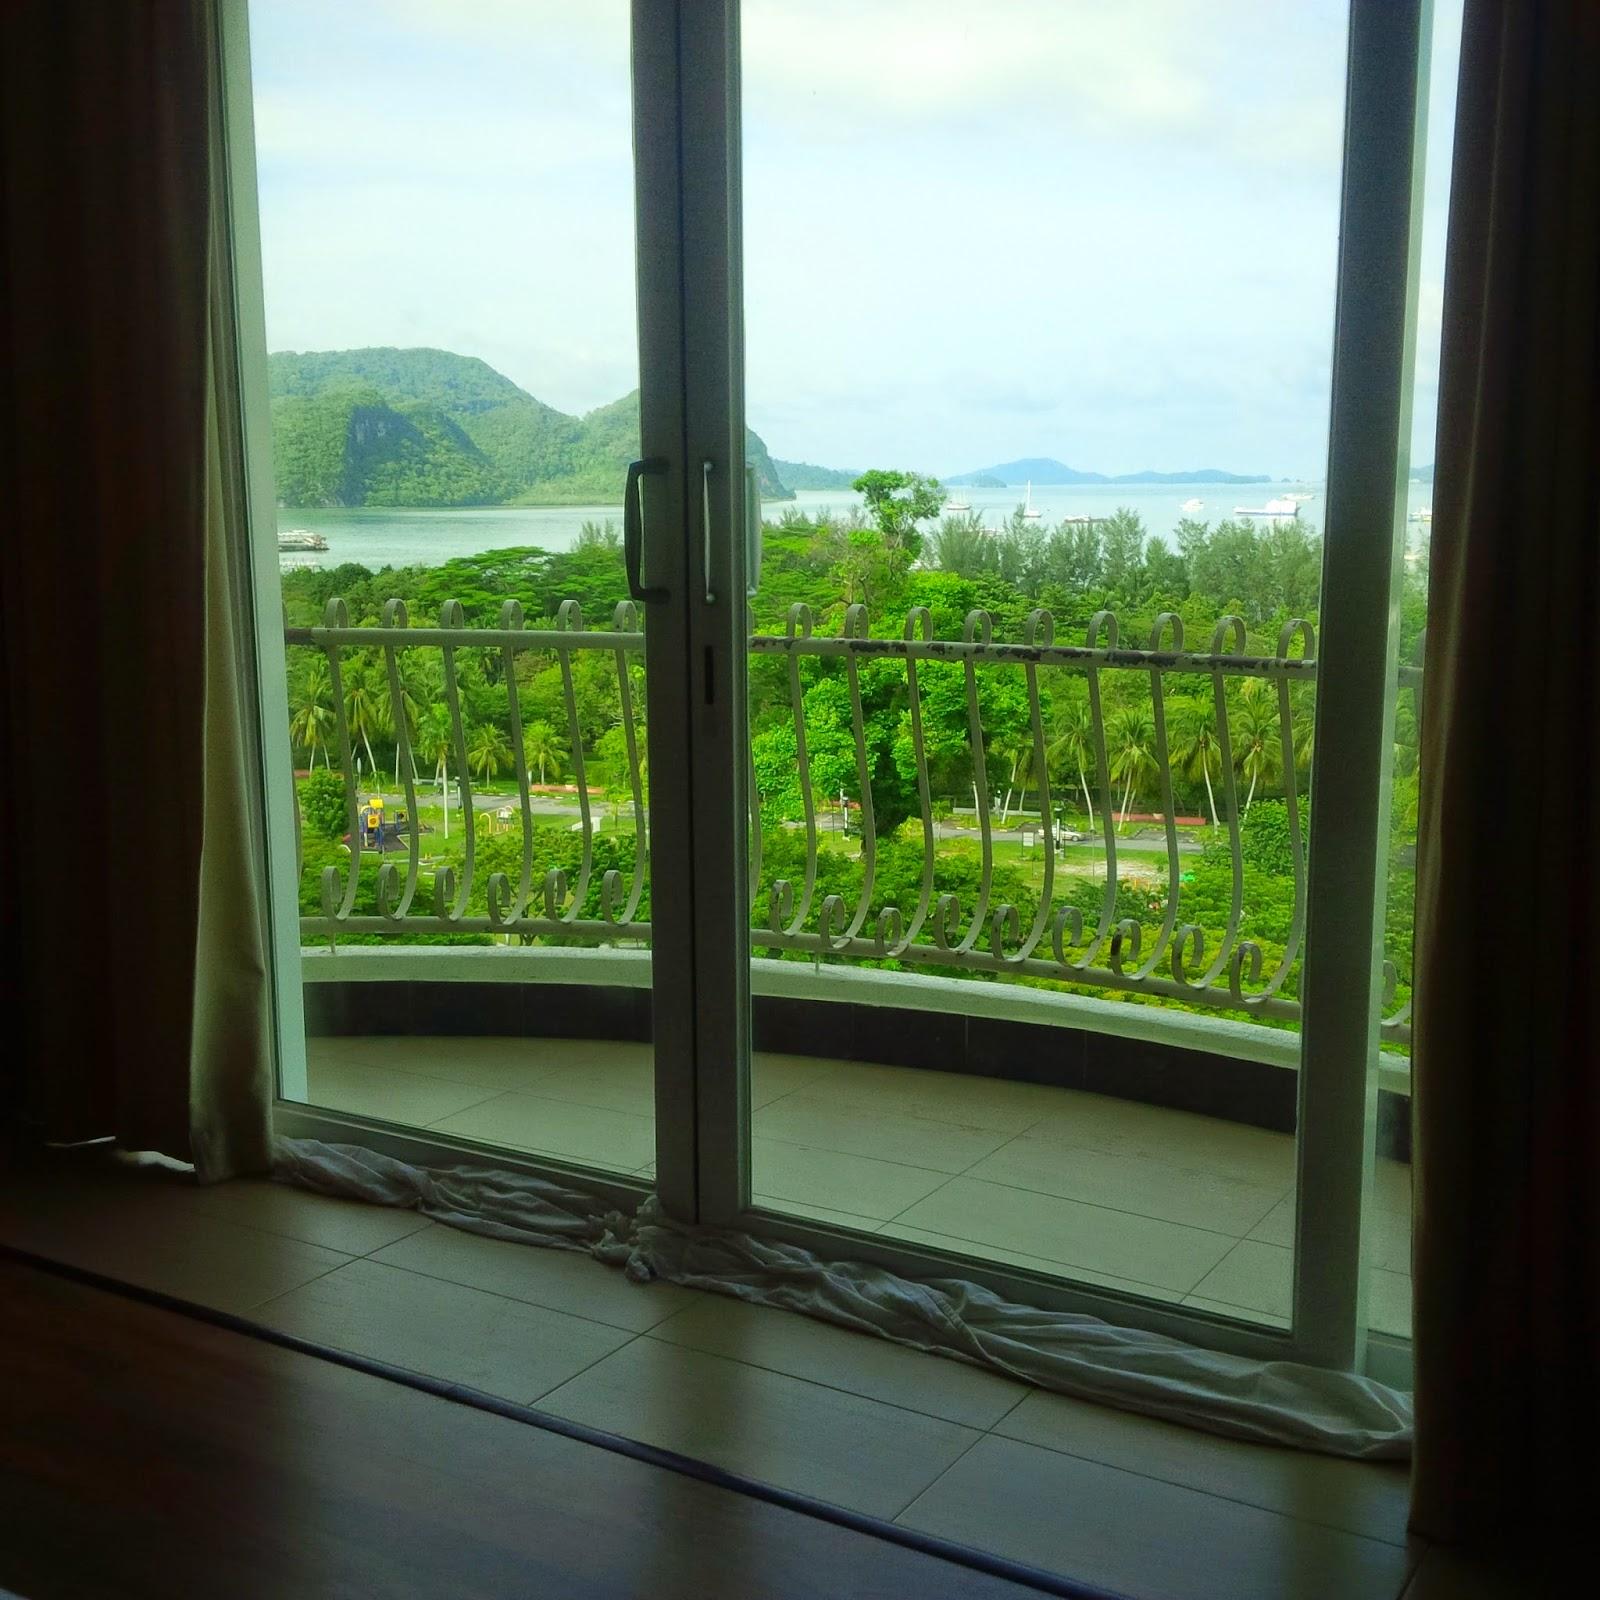 langkawi seaview hotel, near by hotel kuah jetty, spacious rooms, hotel langkawi, best hotels langkawi, top hotels langkawi.